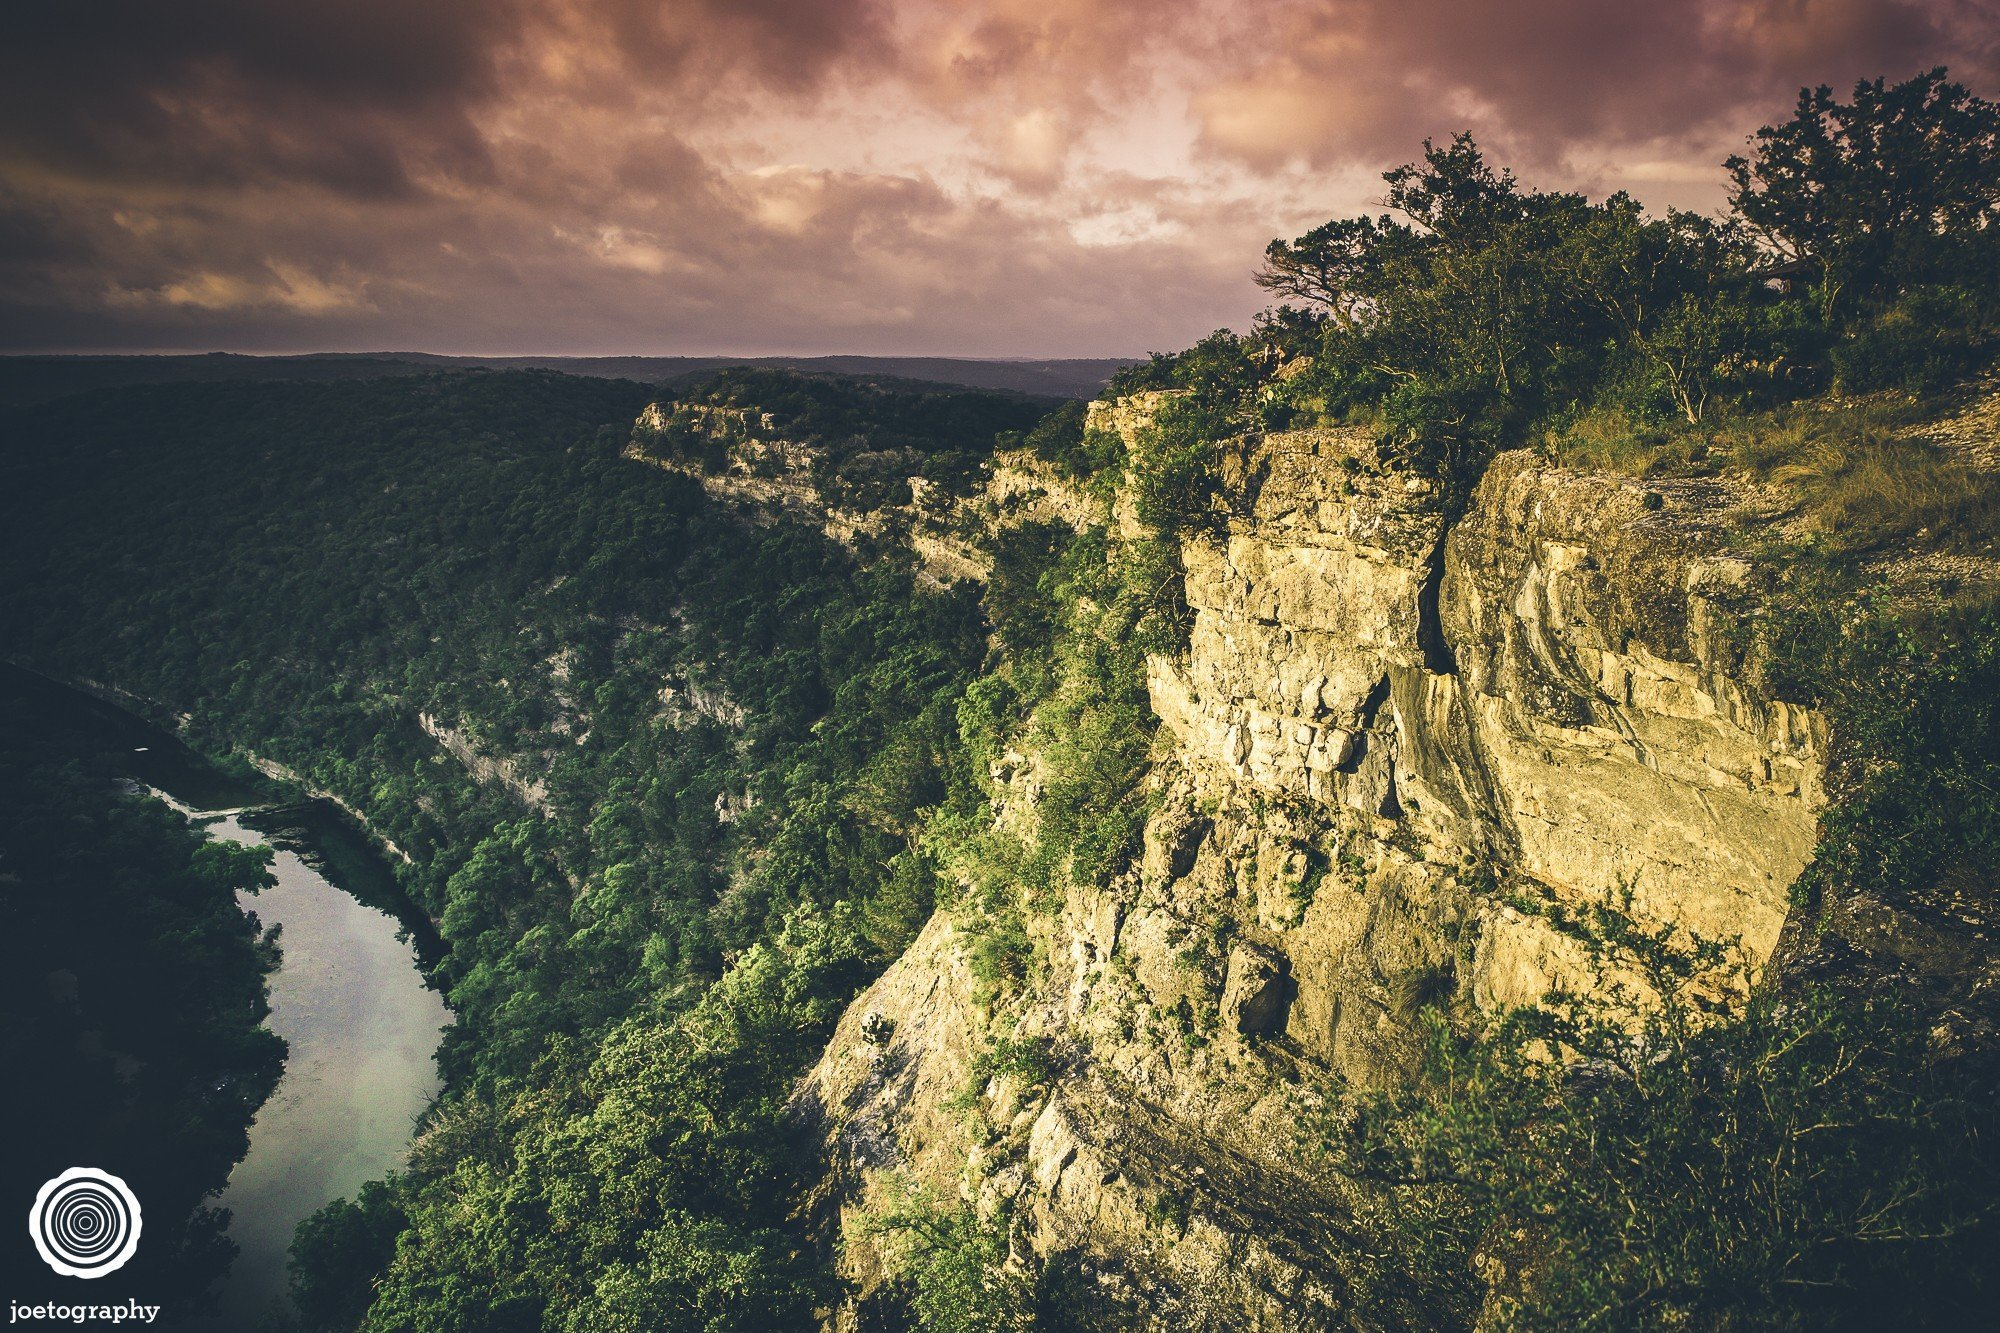 laity-lodge-san-antonio-texas-landscape-photographer-indianapolis-32